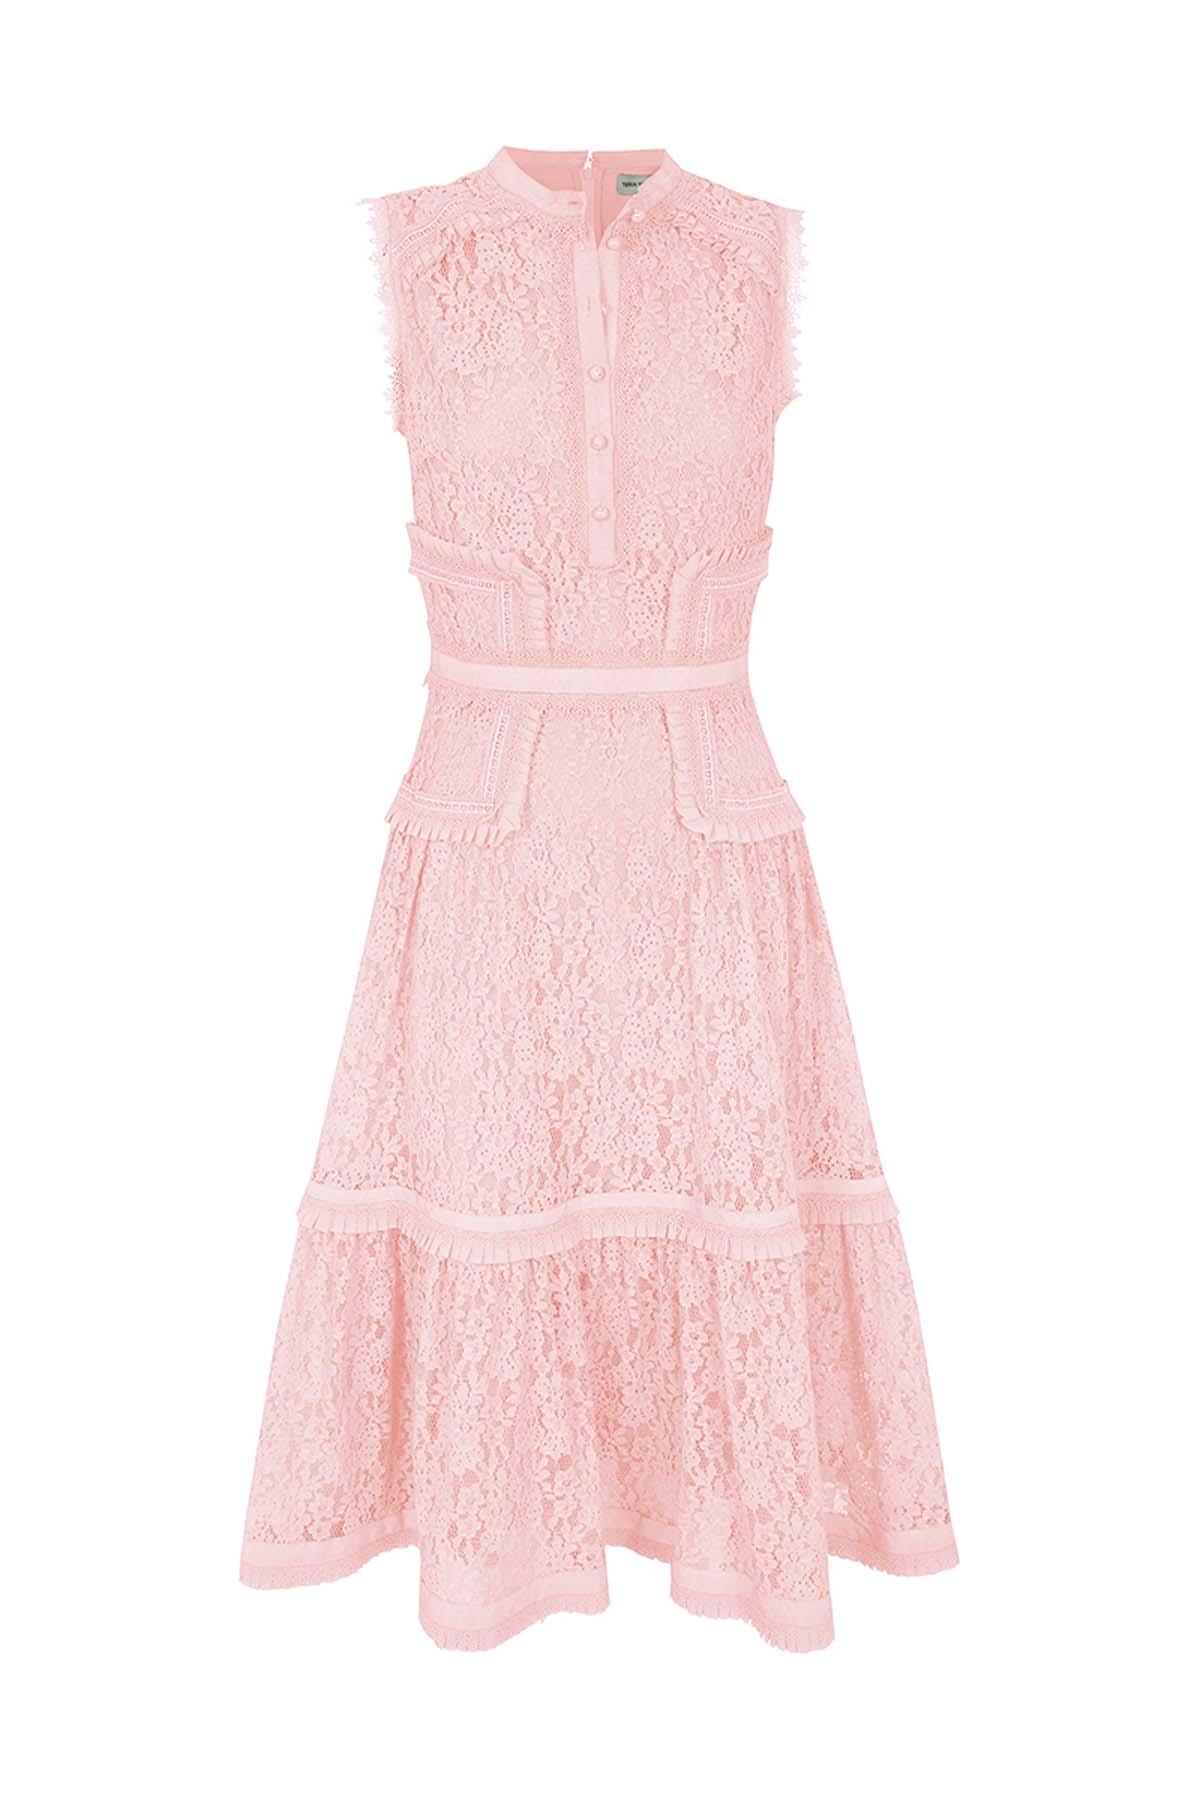 Teria Yabar - Vestido rosa de ceremonia